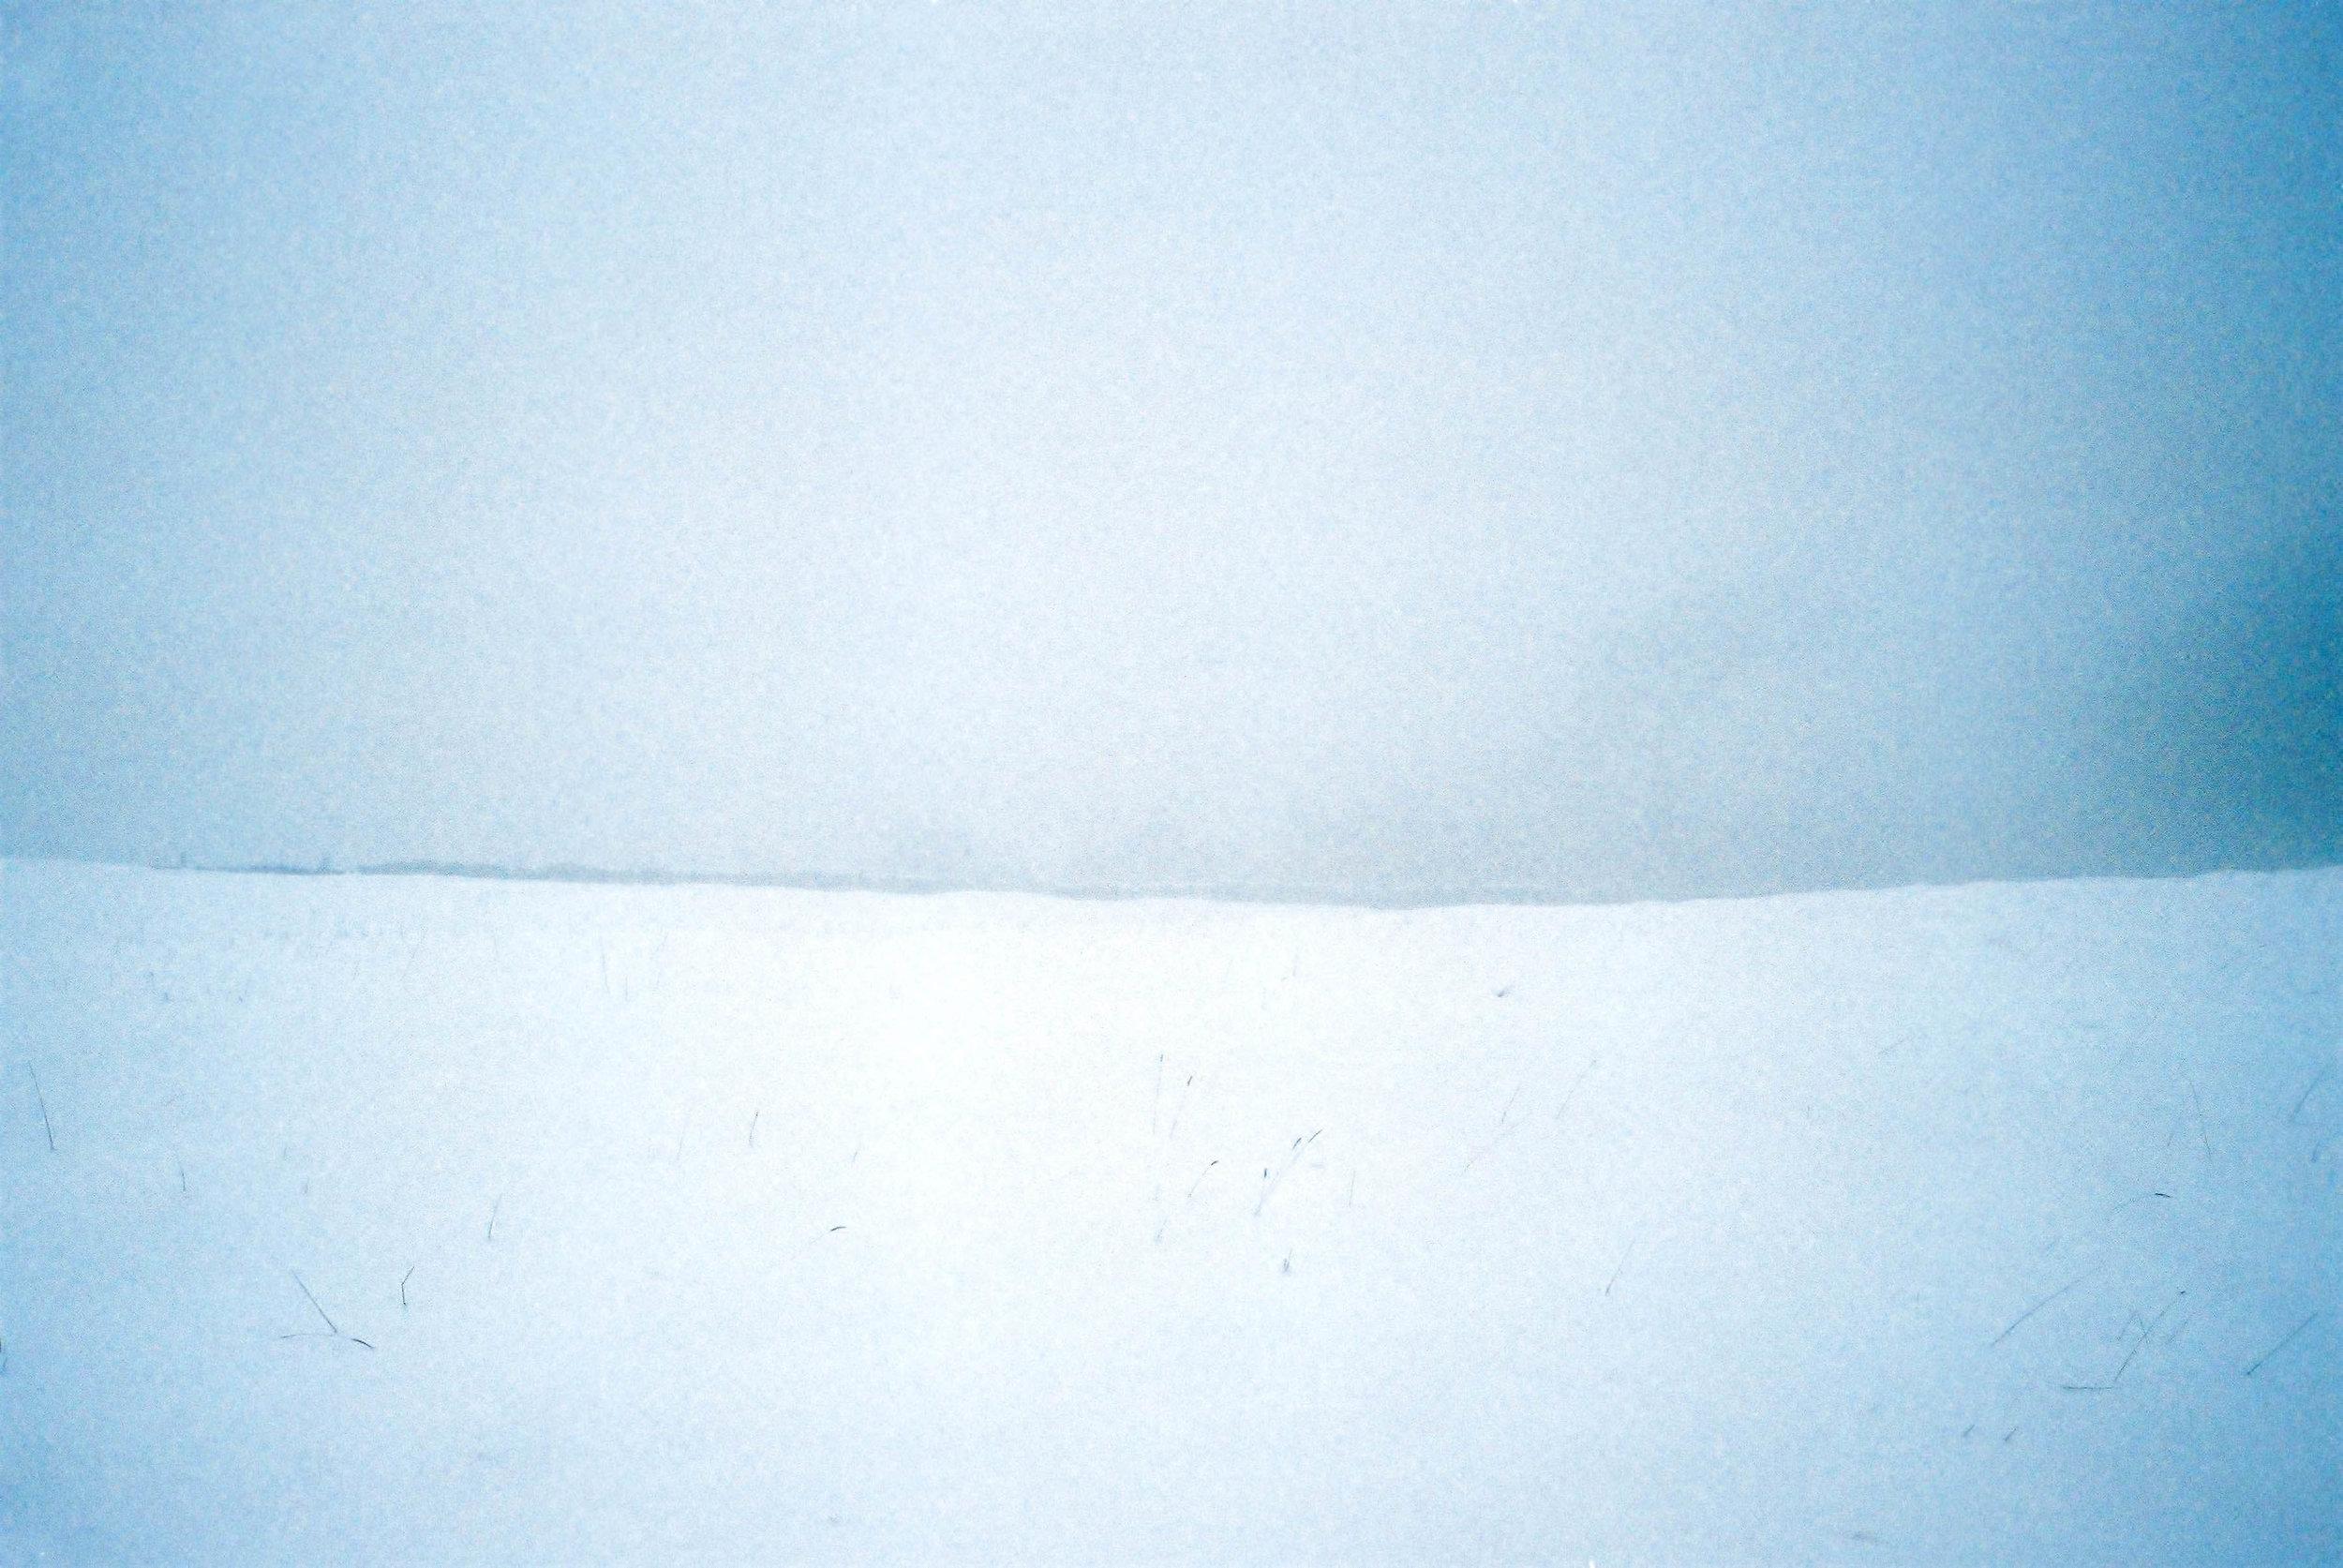 Lucy Wainwright | Untitled | Olympus Trip | Fuji Superia 200